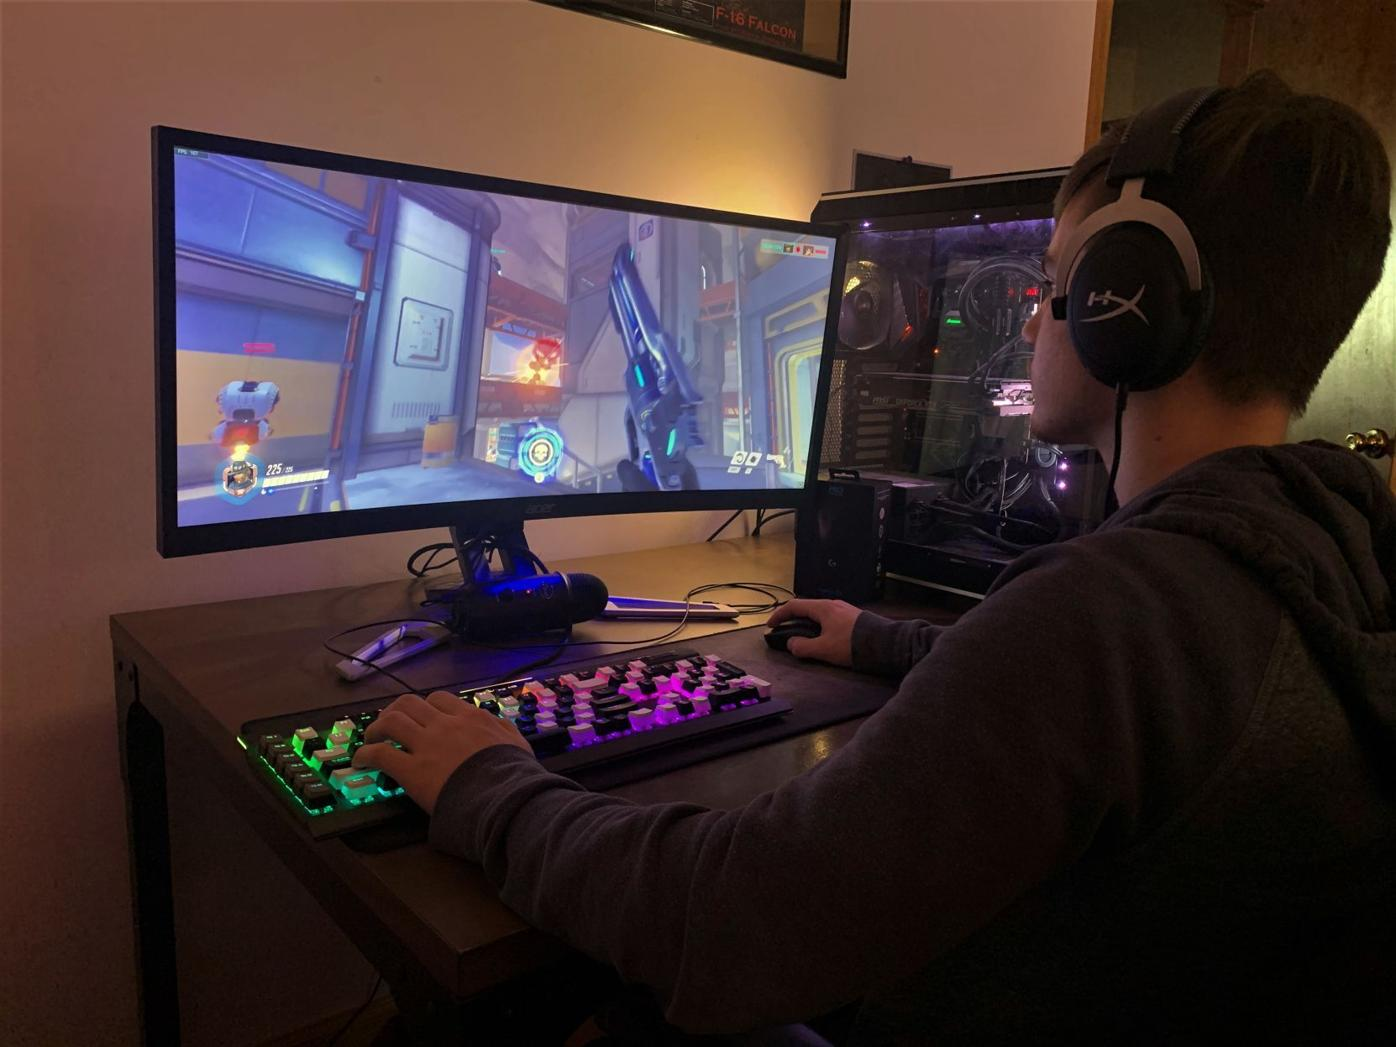 Crestwood's Esports Club member Kurt Grenzberg plays on his computer